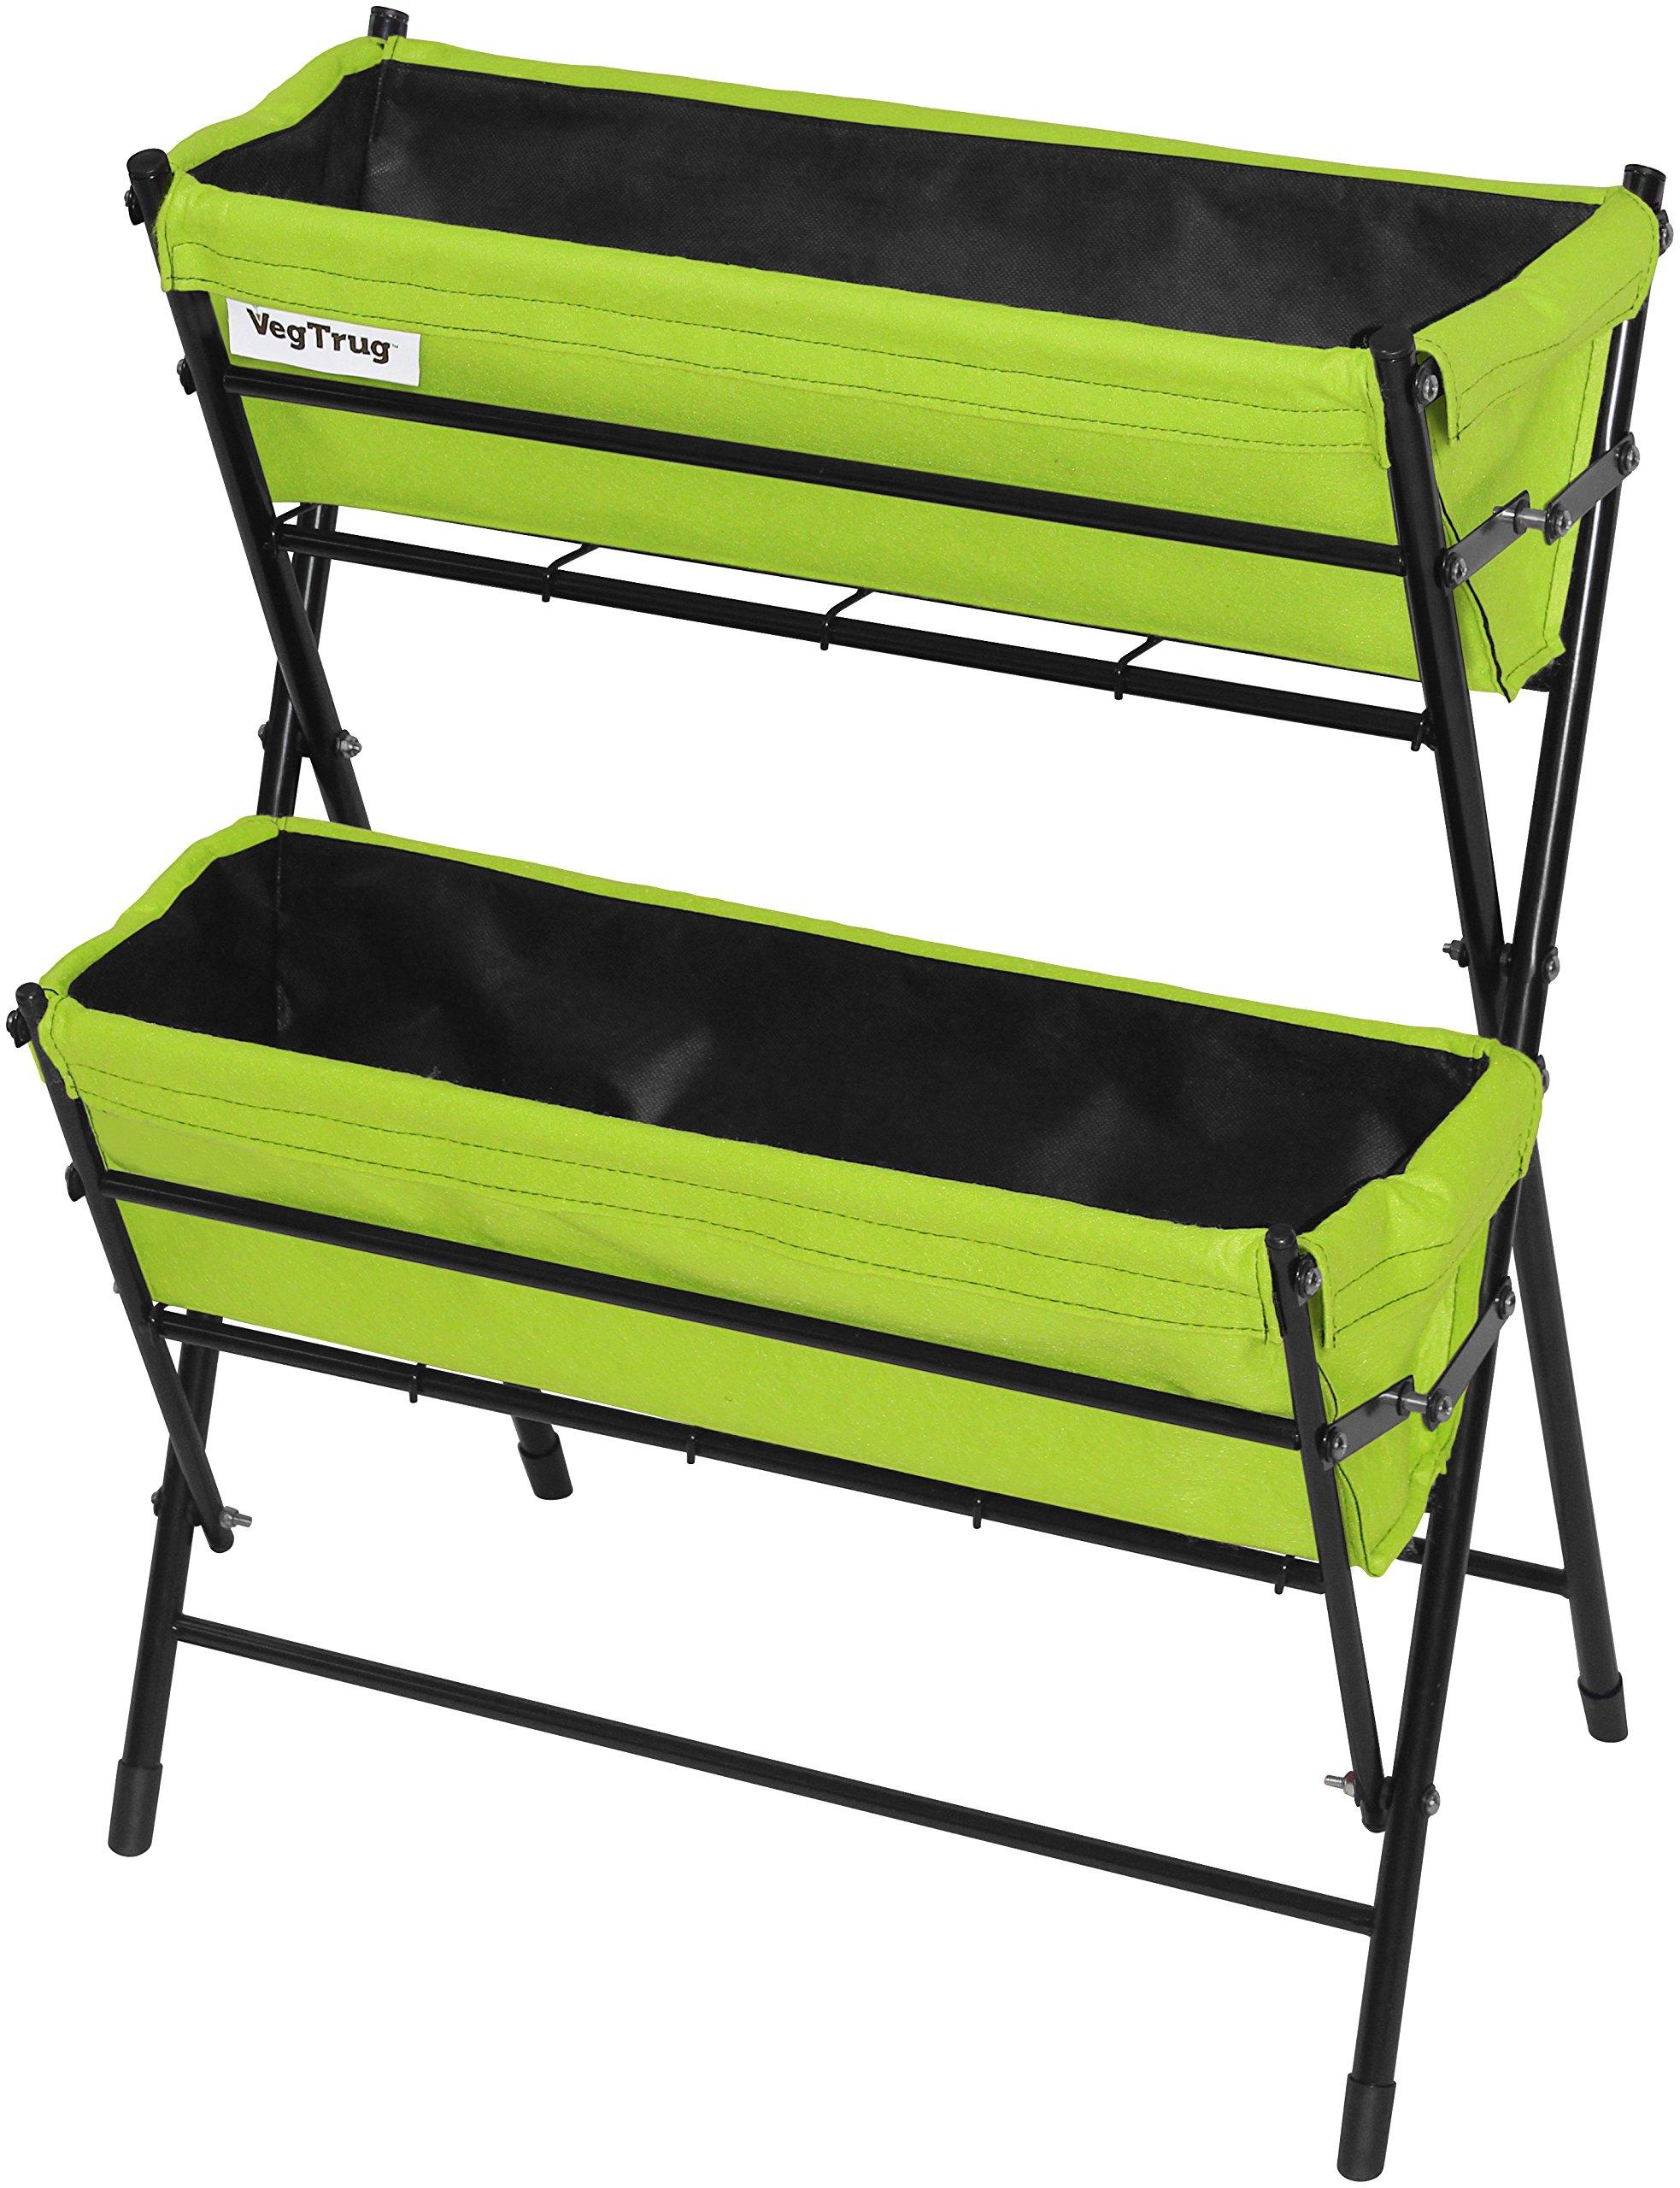 Vegtrug POP2WL302LG USA Poppy 2 Tier Ladder, Lime Green